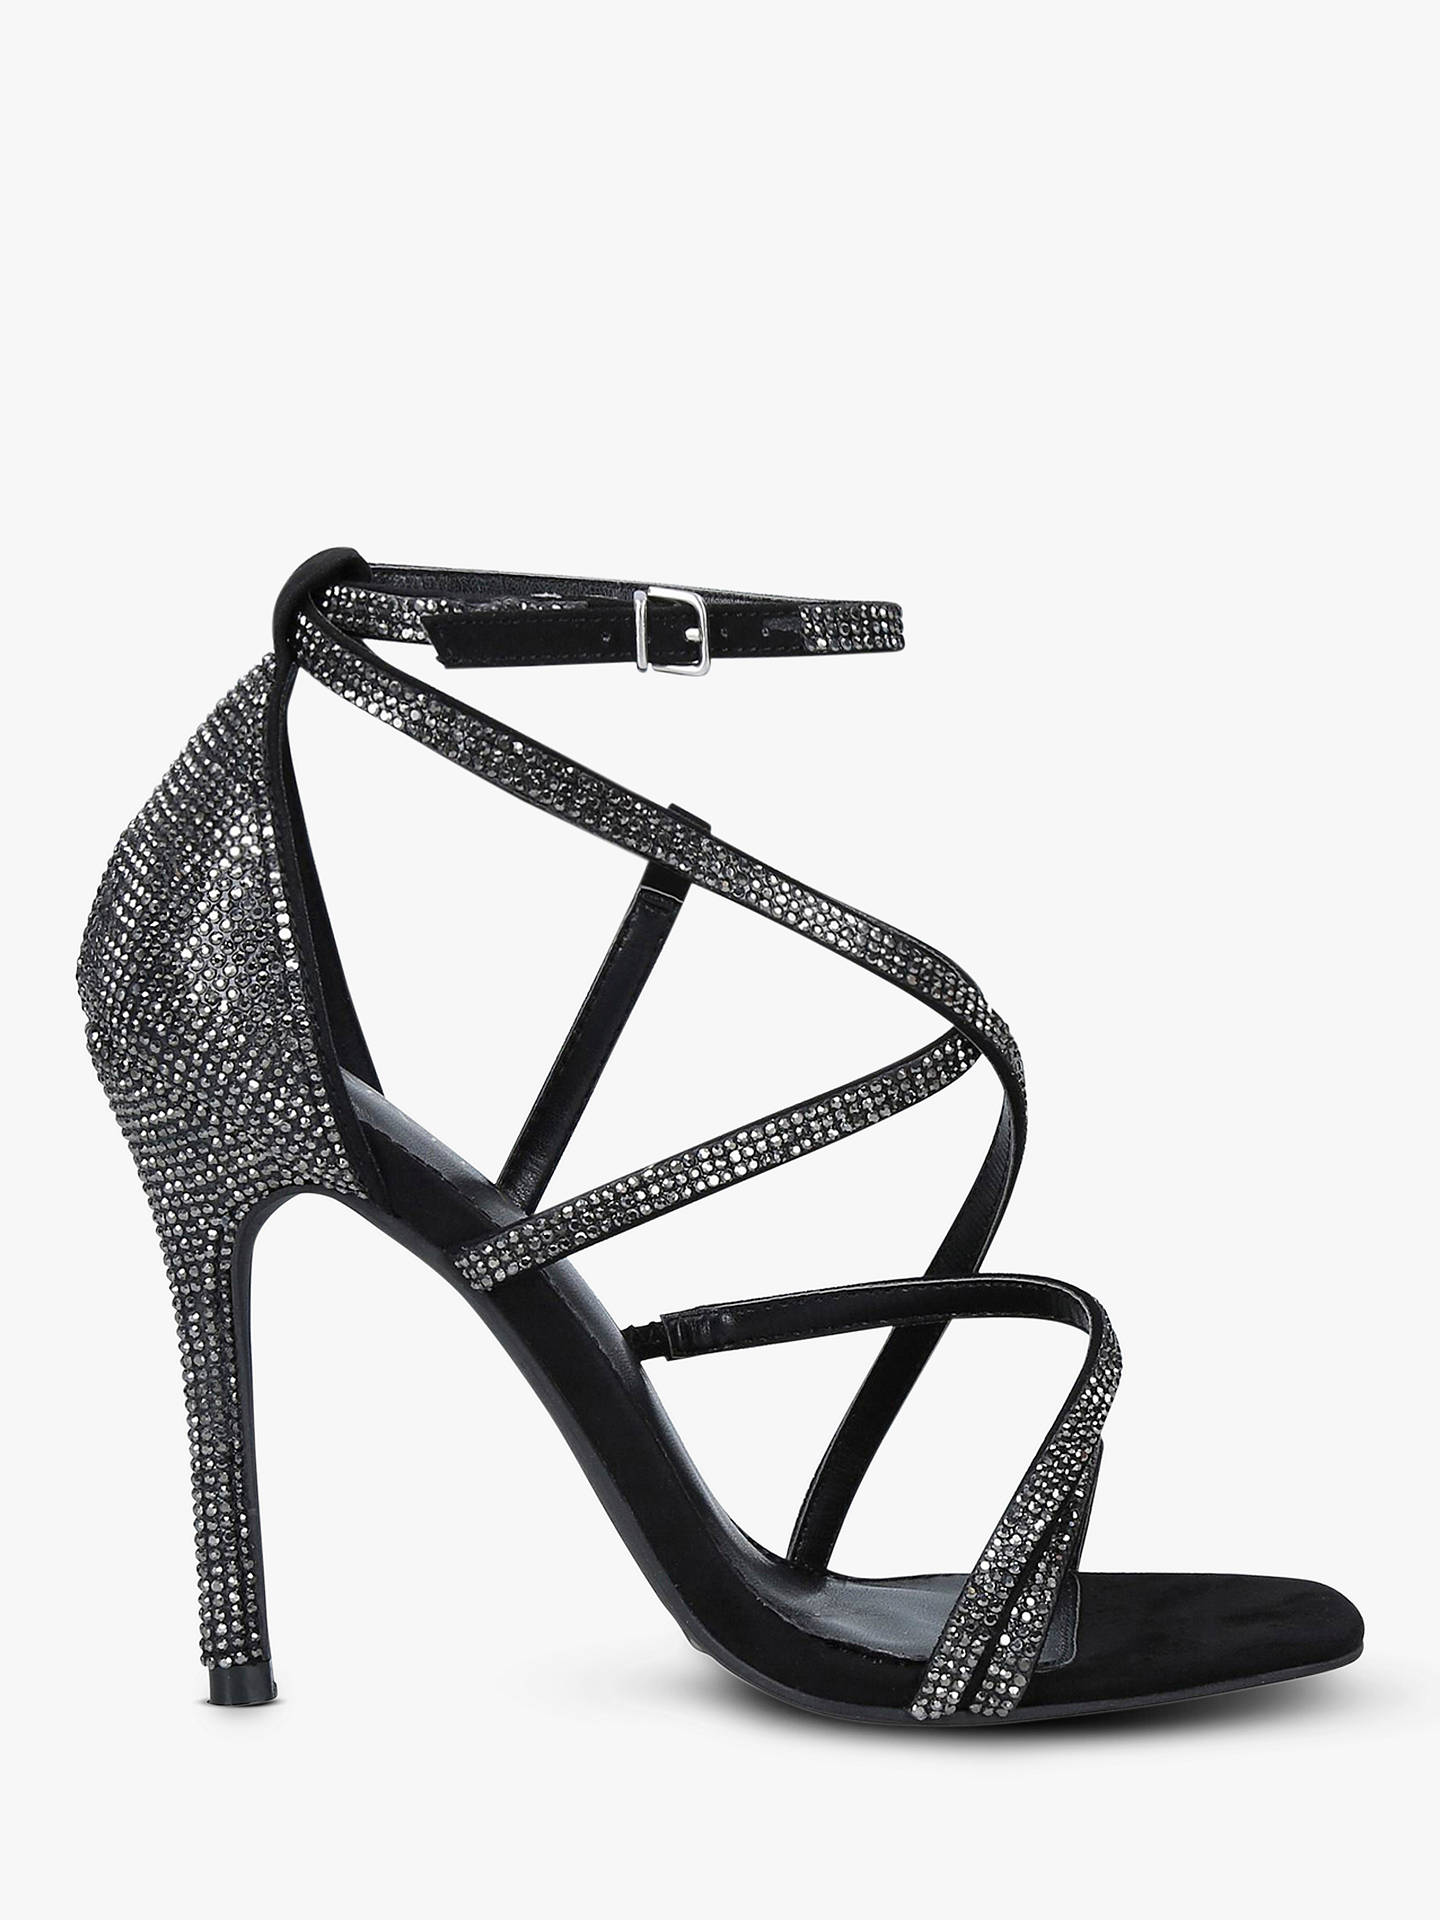 6da649ac049 Carvela Ginger Sparkly Stiletto Heel Strappy Sandals, Black